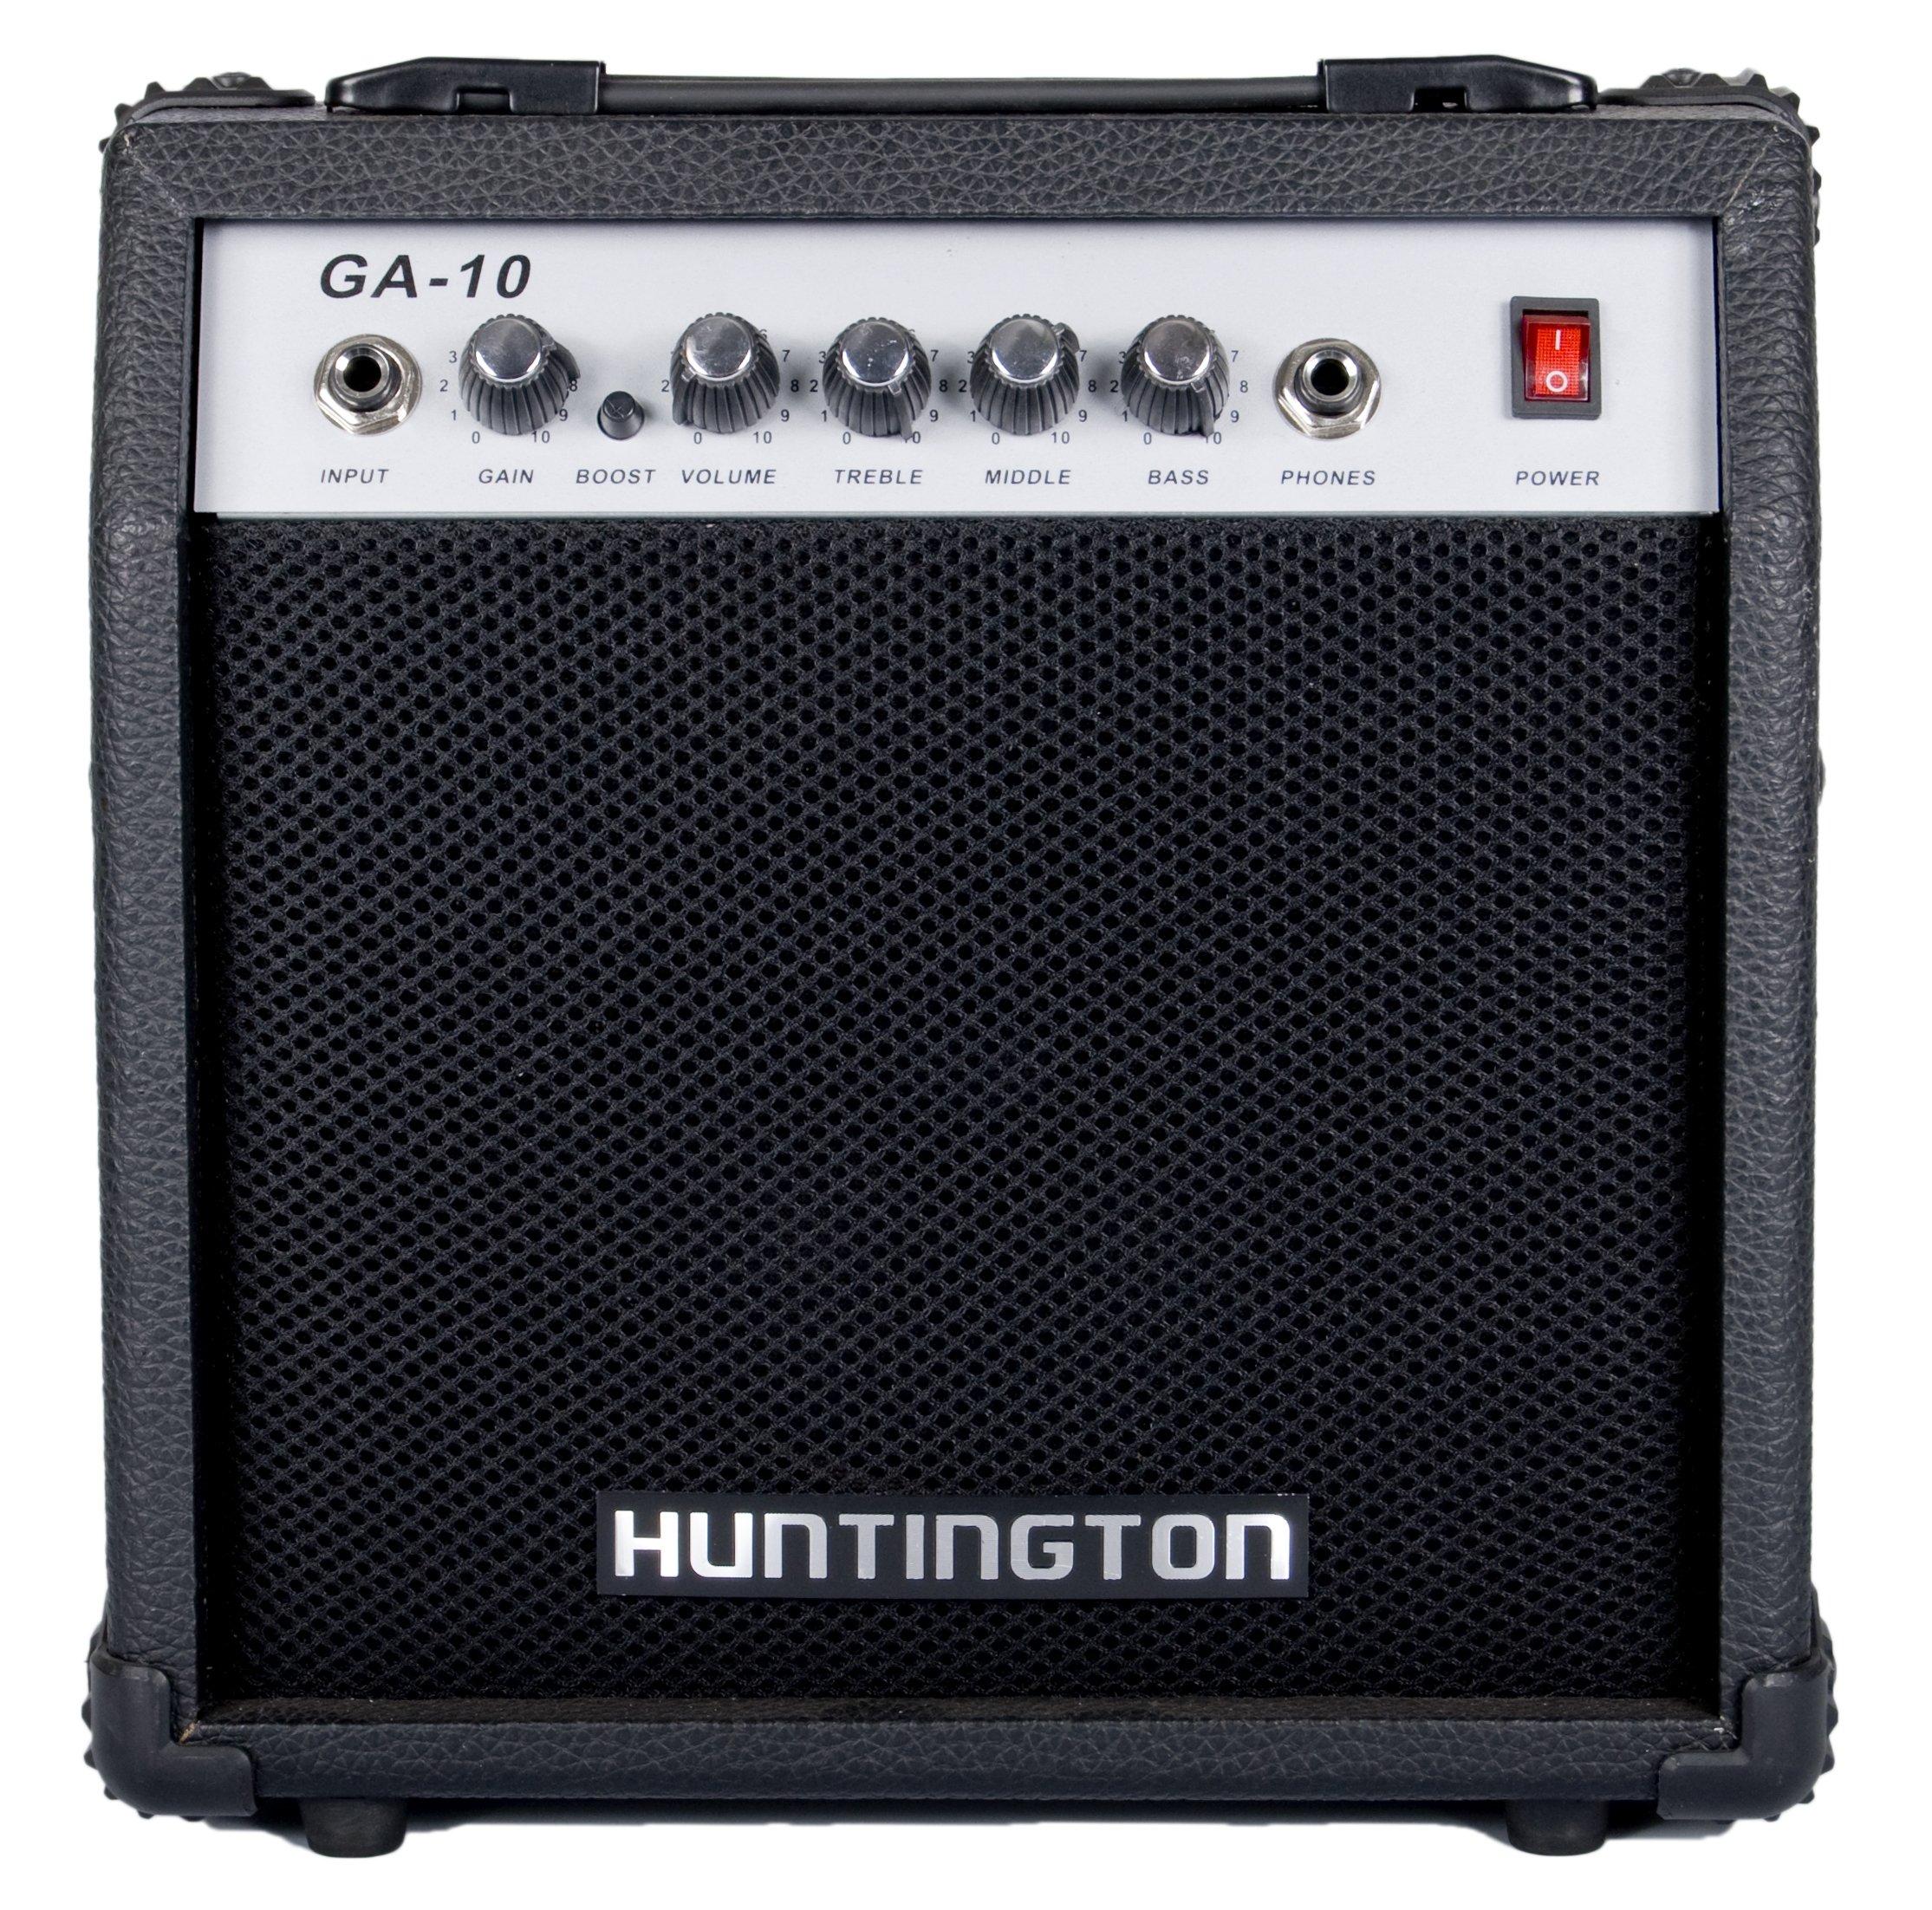 Huntington AMP-G10 10-Watts Mini Amplifier by Huntington